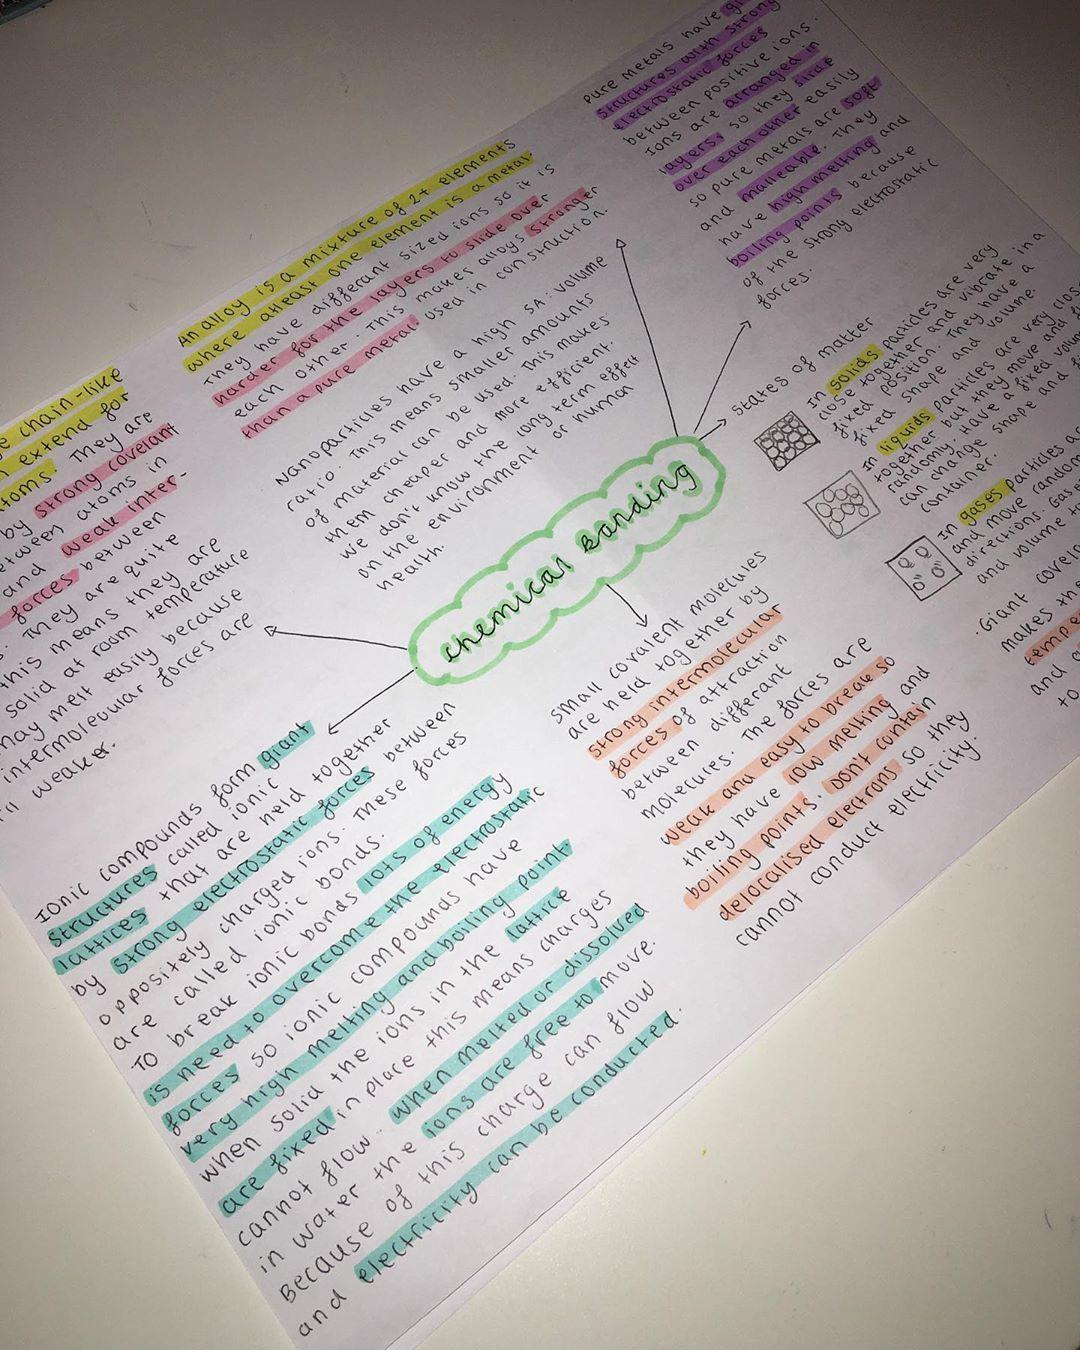 1 6k On Instagram Chemistry Topic 2 Mindmaps Dm Me For Full Pic Gcse Gcses Gcse2020 Gcserevise Gcserevisio Aqa Chemistry Gcse Revision Chemistry